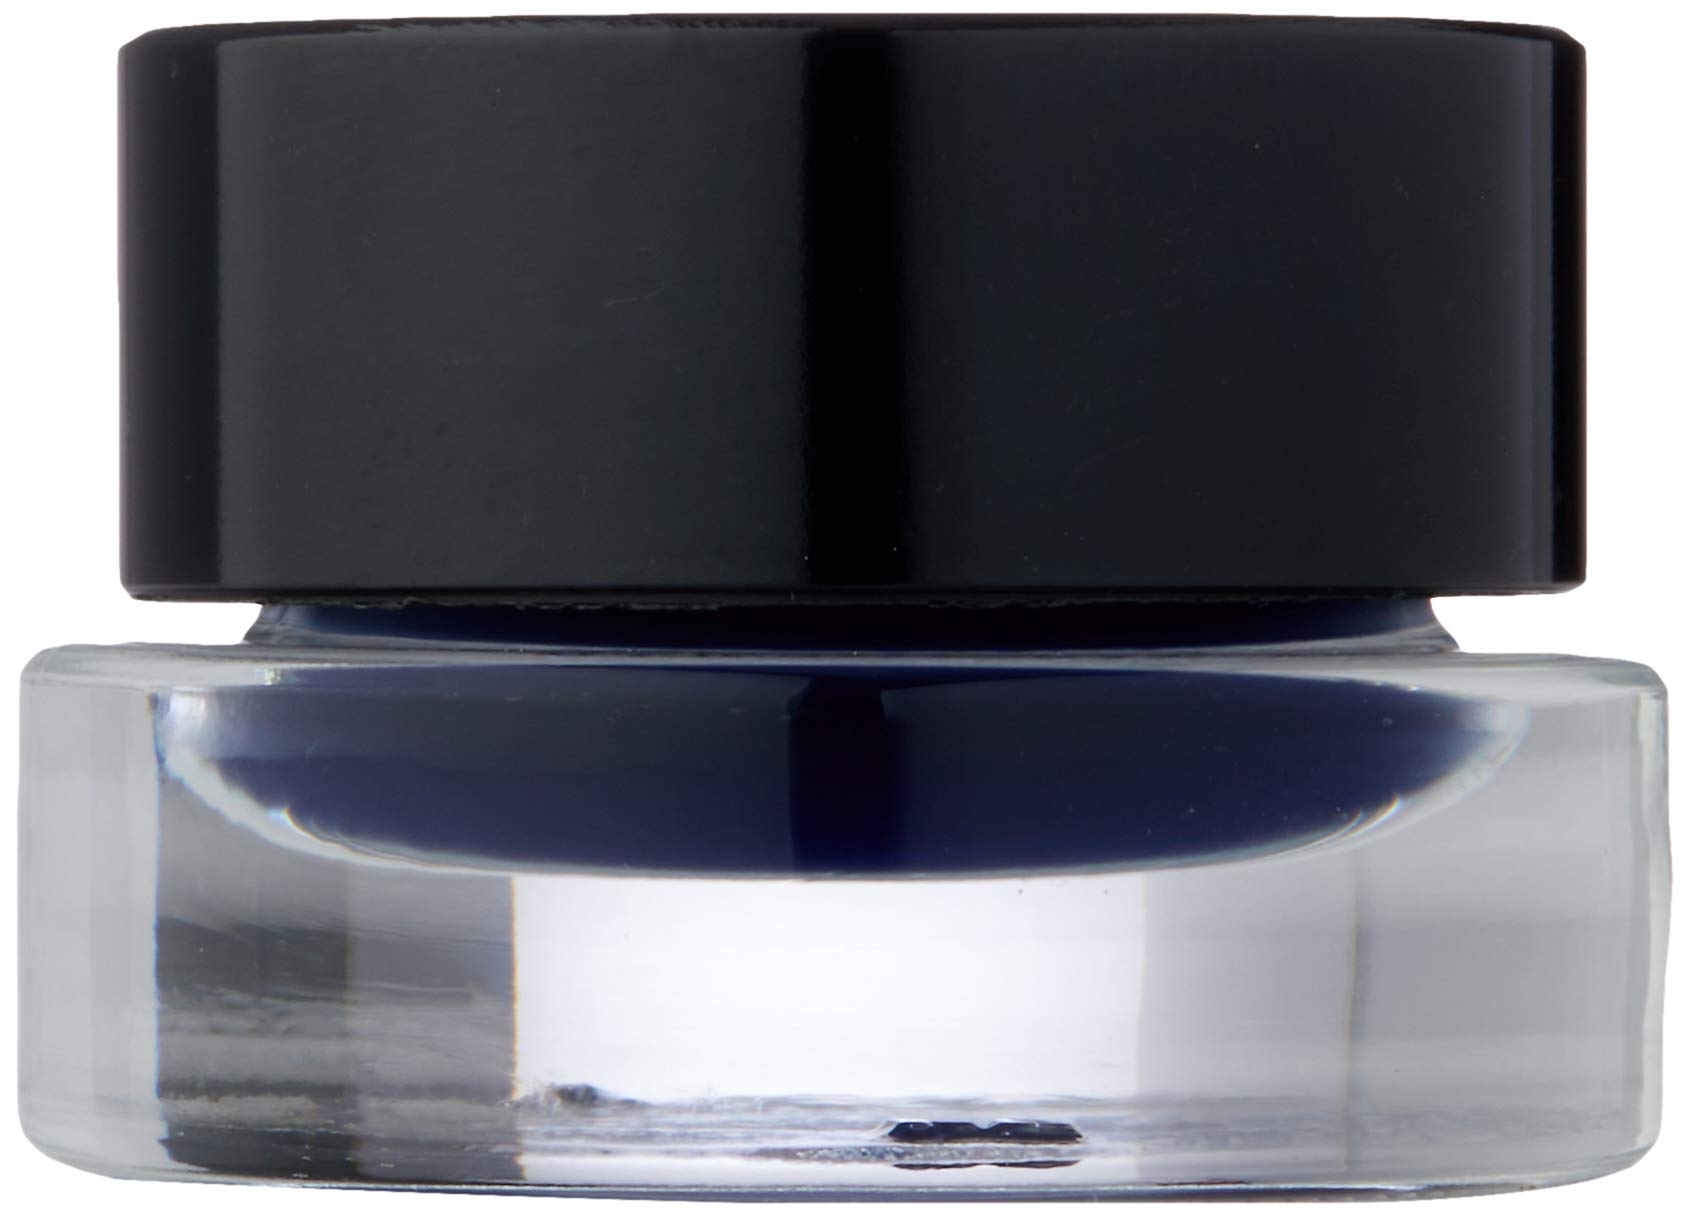 Bobbi Brown Long Wear Gel Eyeliner, No. 03 Cobalt Ink, 0.1 Ounce by Bobbi Brown (Image #4)